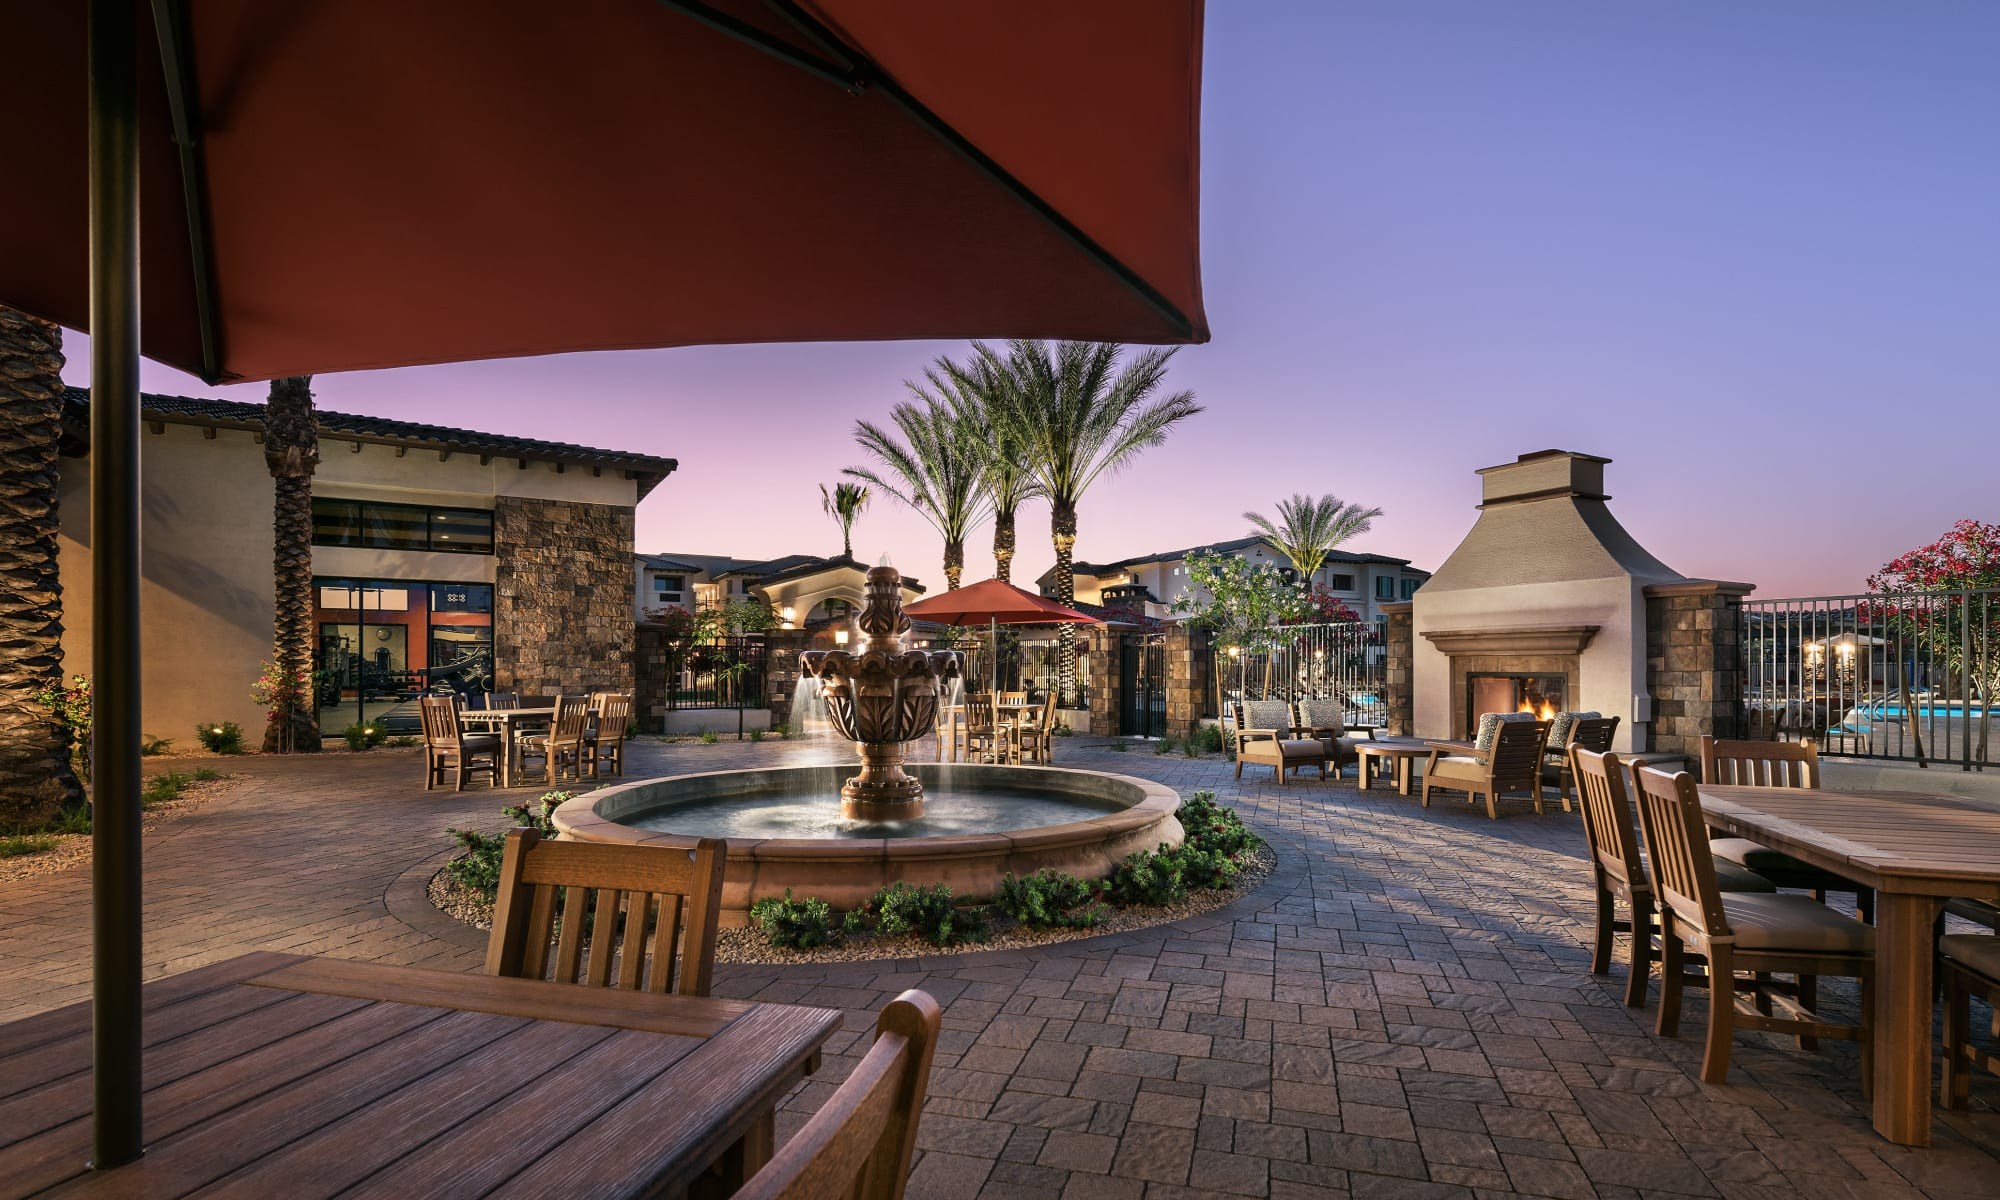 Outdoor fireside community area at San Artes in Scottsdale, Arizona